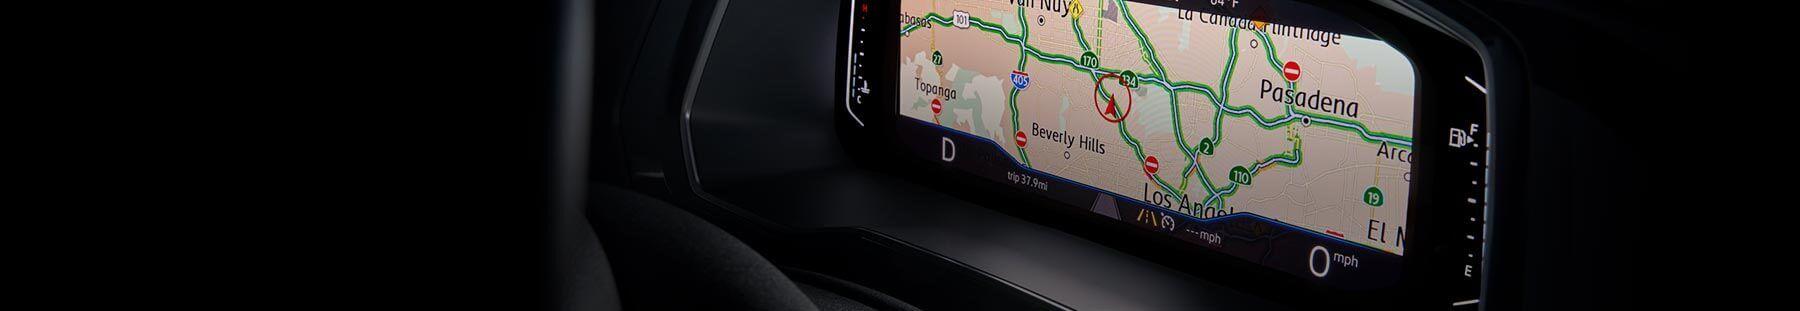 All New Volkswagen Jetta in Gilbert, AZ